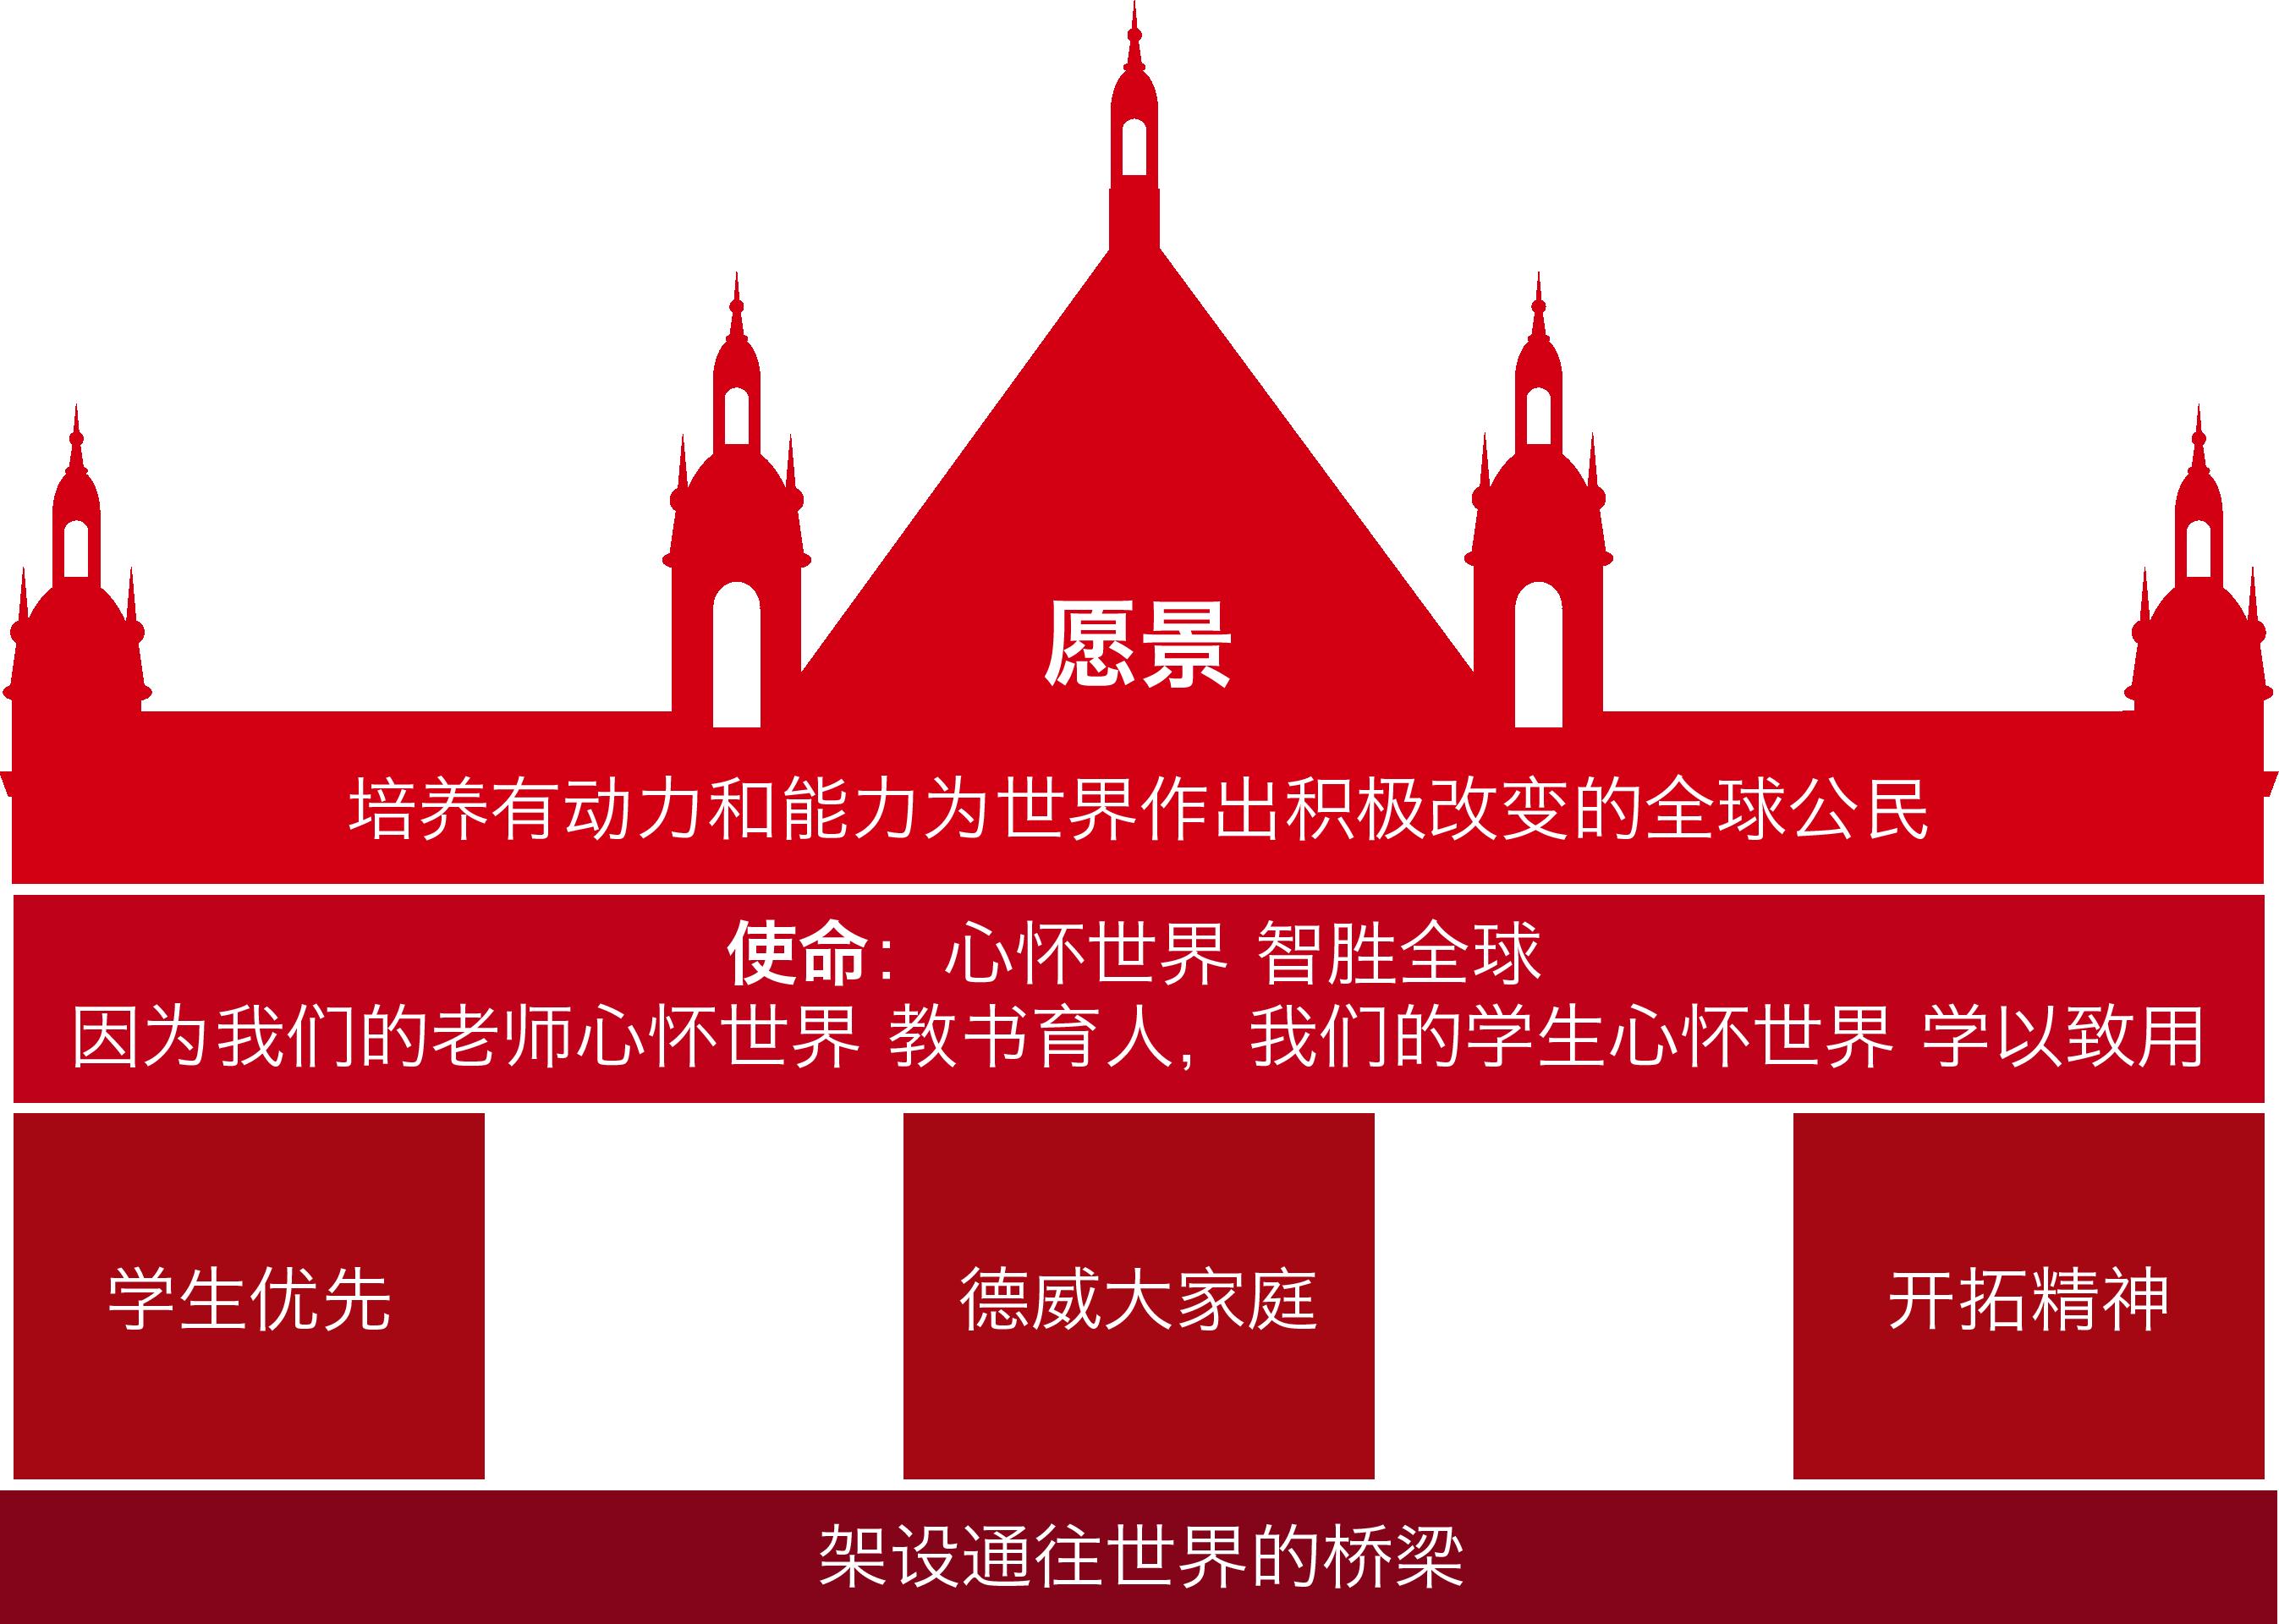 barry-building-red-cn-北京德威英国国际学校-20200827-110618-768